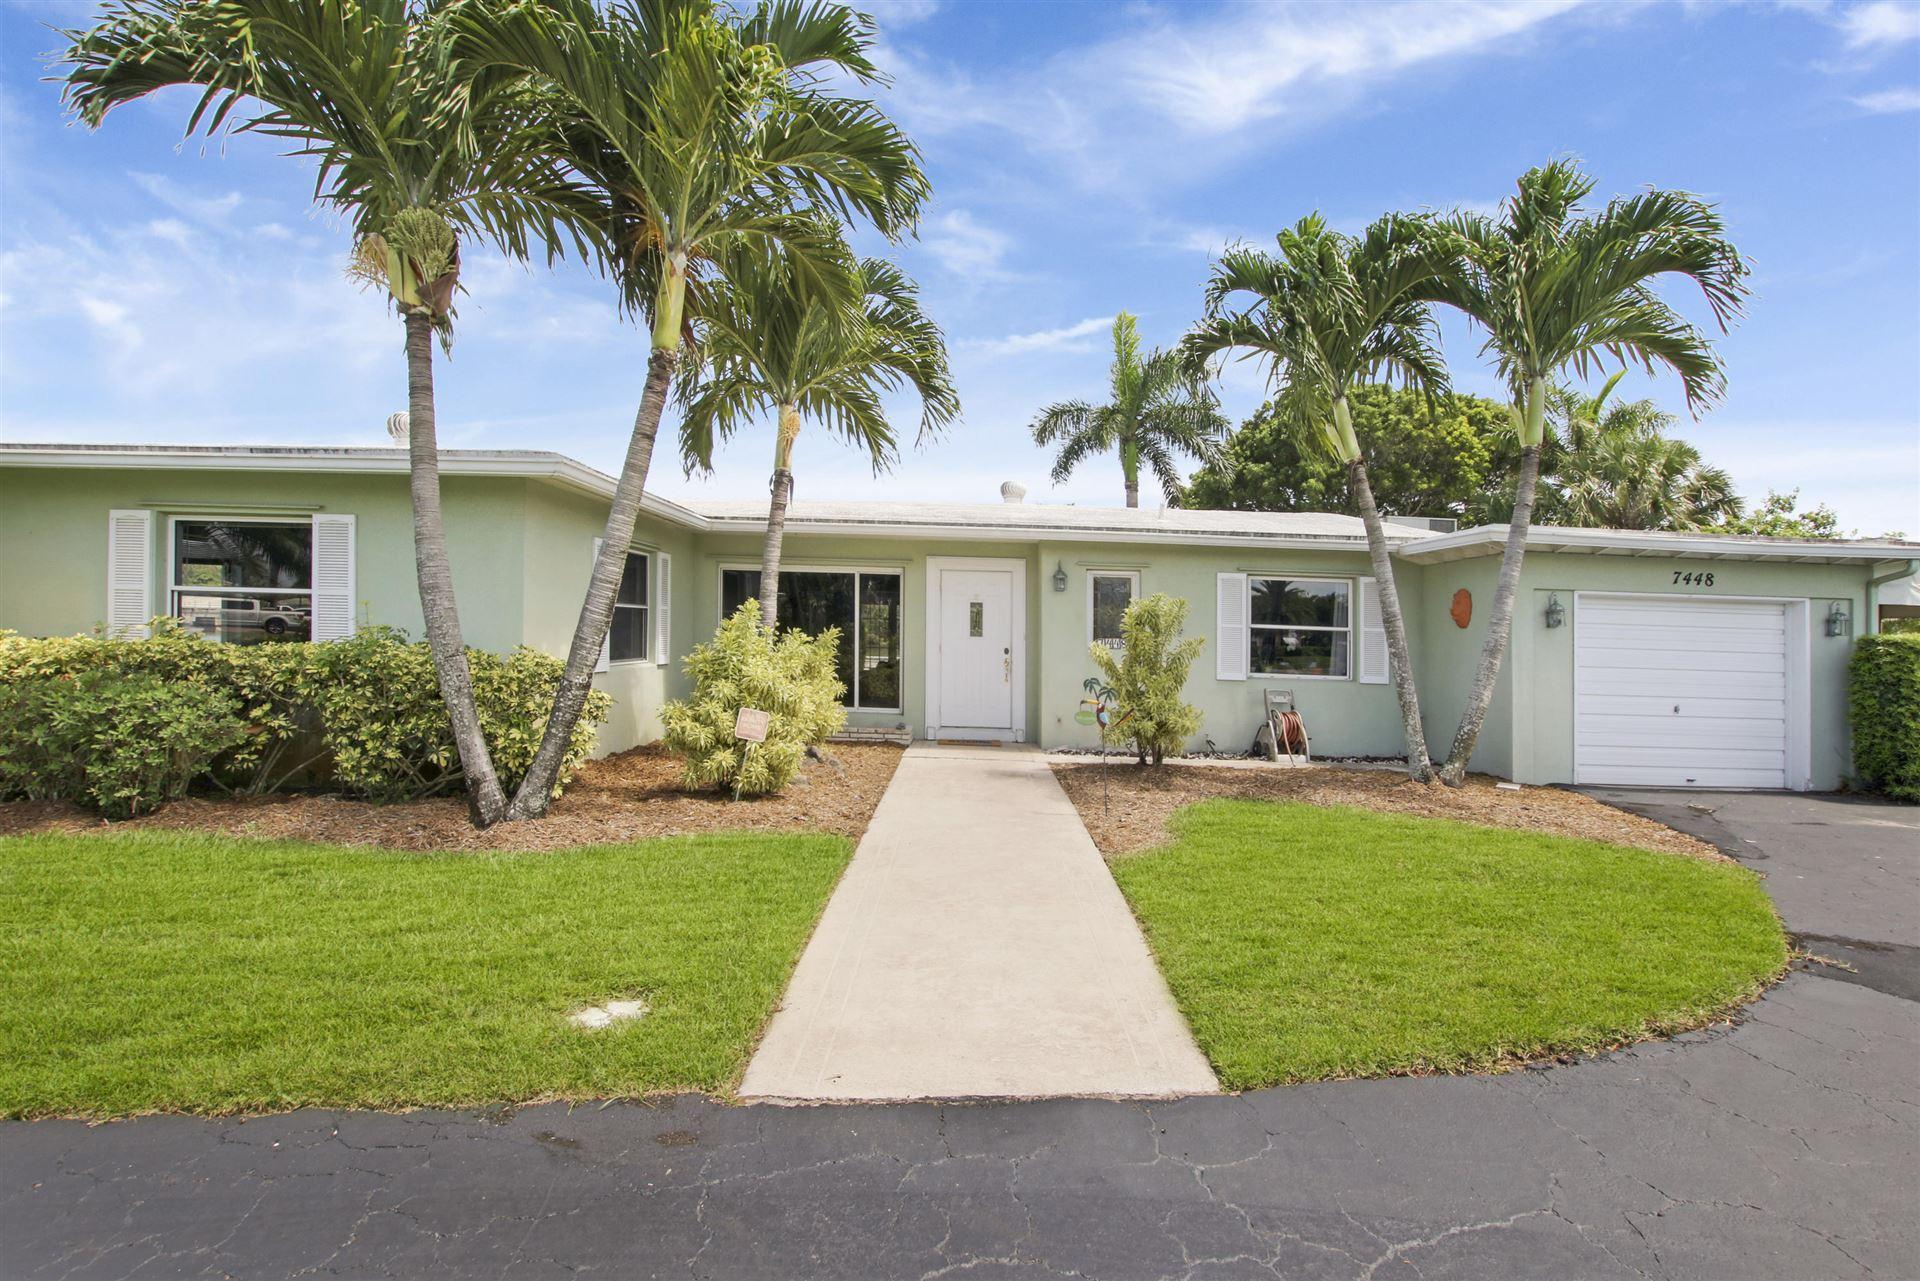 7448 Venetian Way, Lake Clarke Shores, FL 33406 - #: RX-10634764